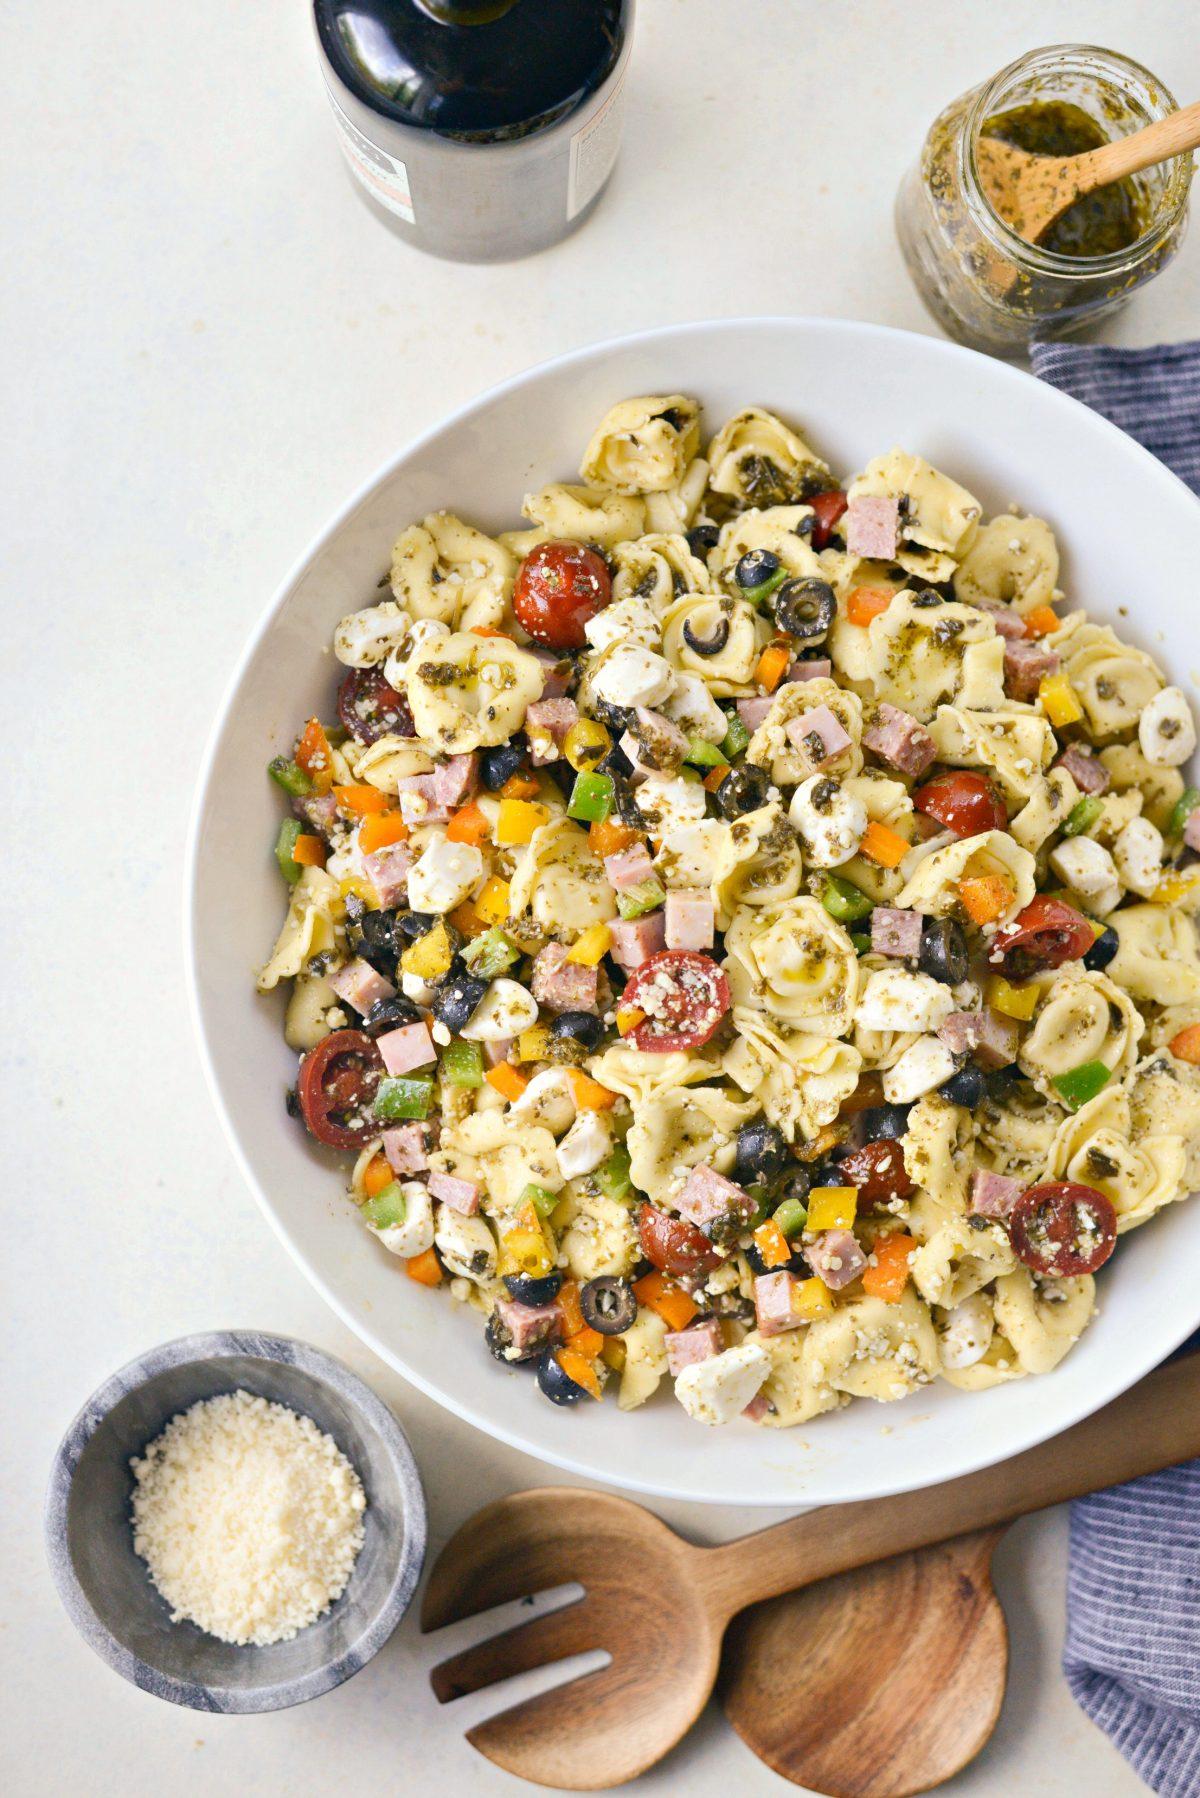 Antipasto Tortellini Pasta Salad with Basil Pesto Vinaigrette l SimplyScratch.com